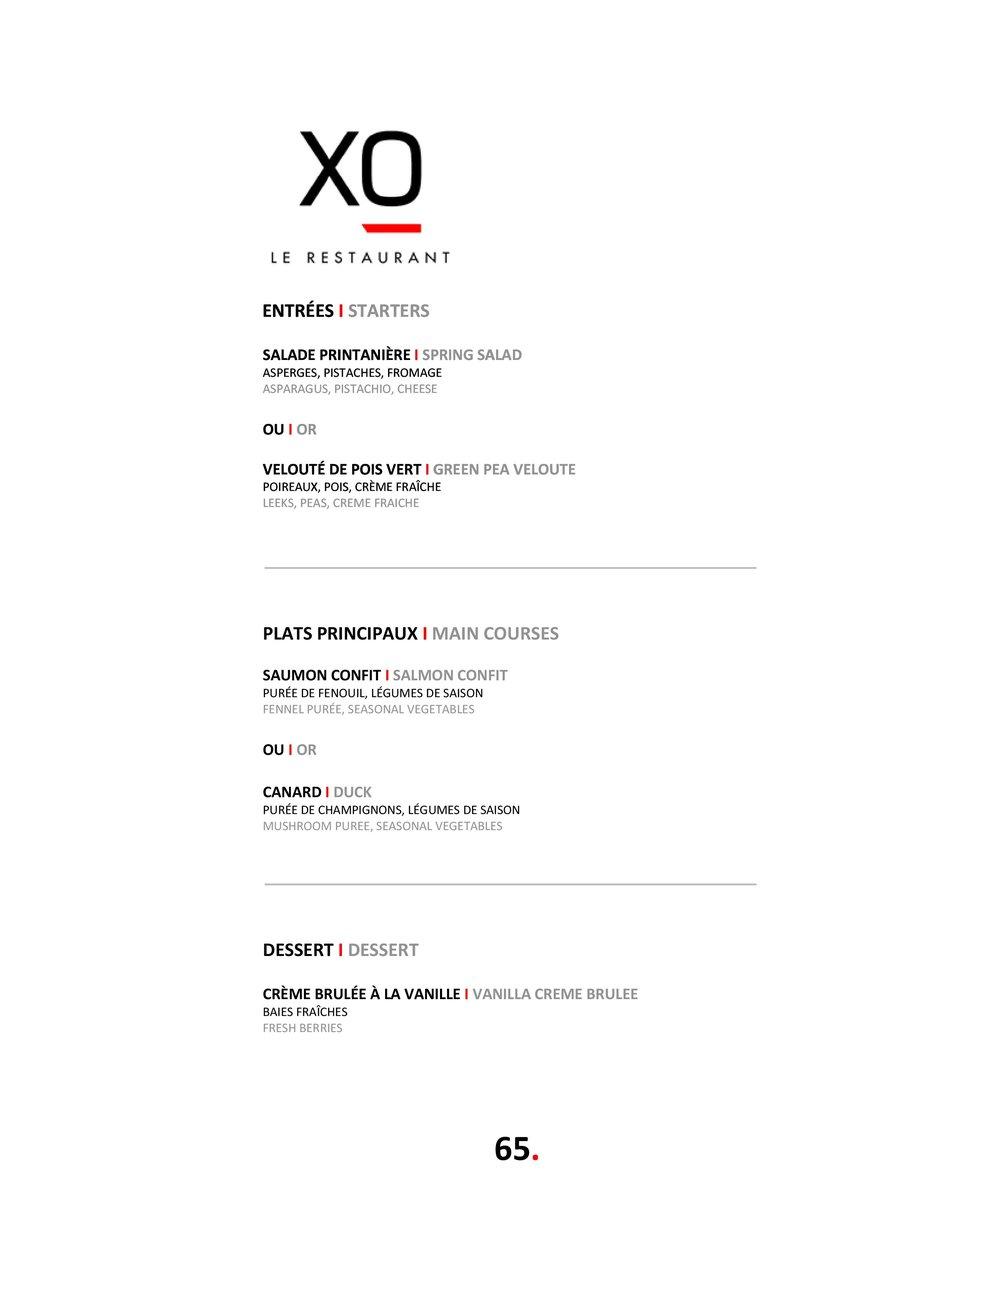 MENU 65 $-page-001(1).jpg